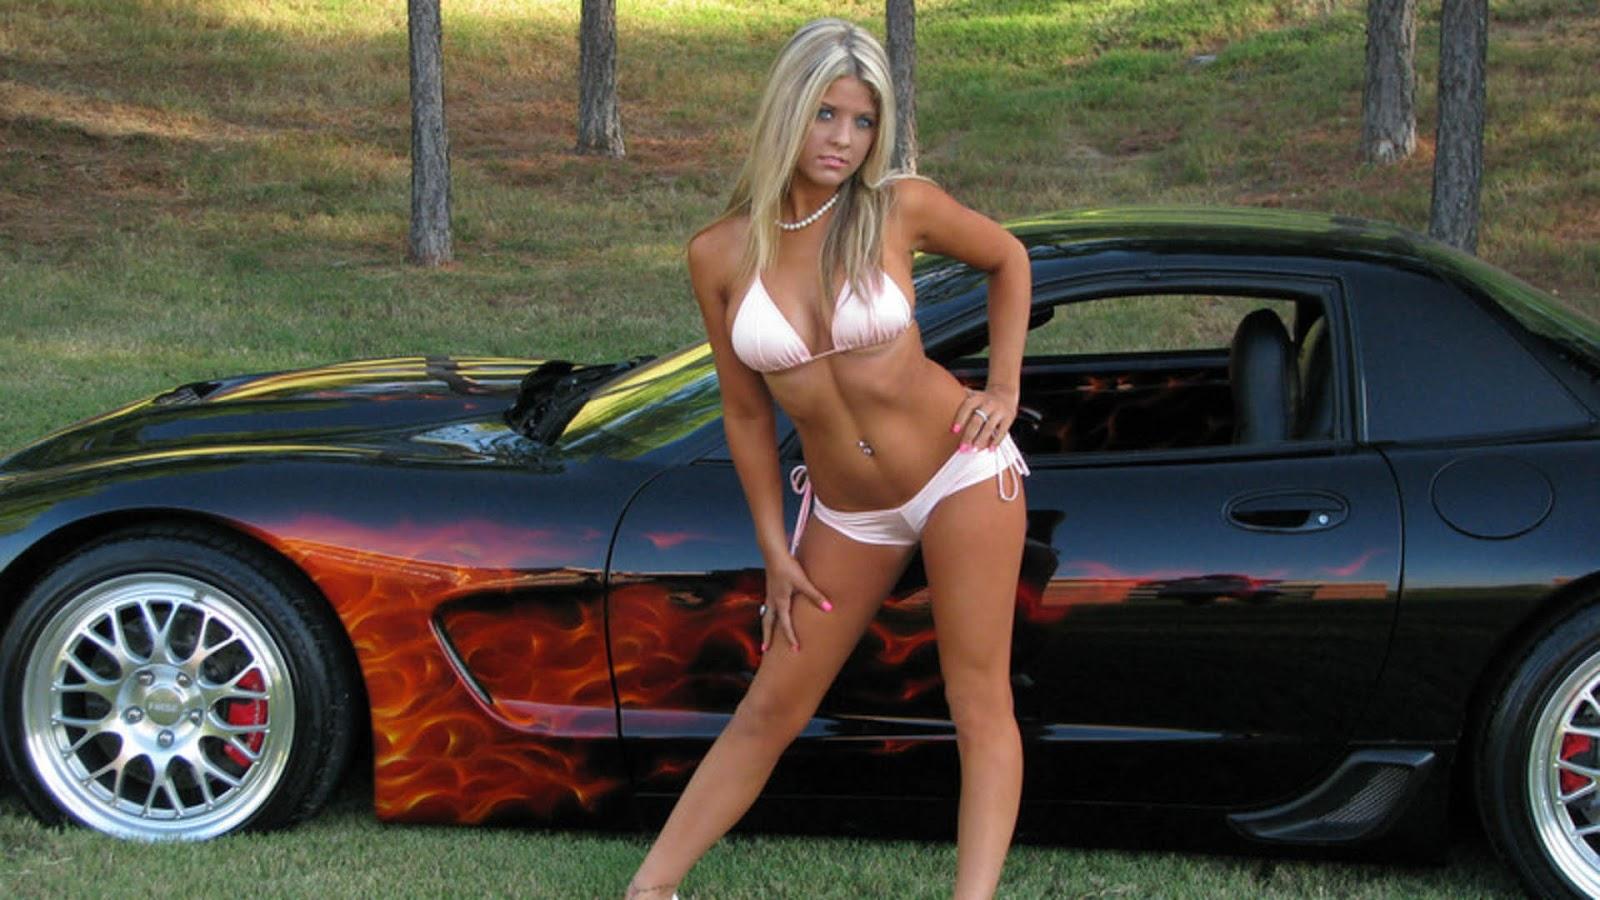 Hot Cars And Hot Girls Nude Photos 82